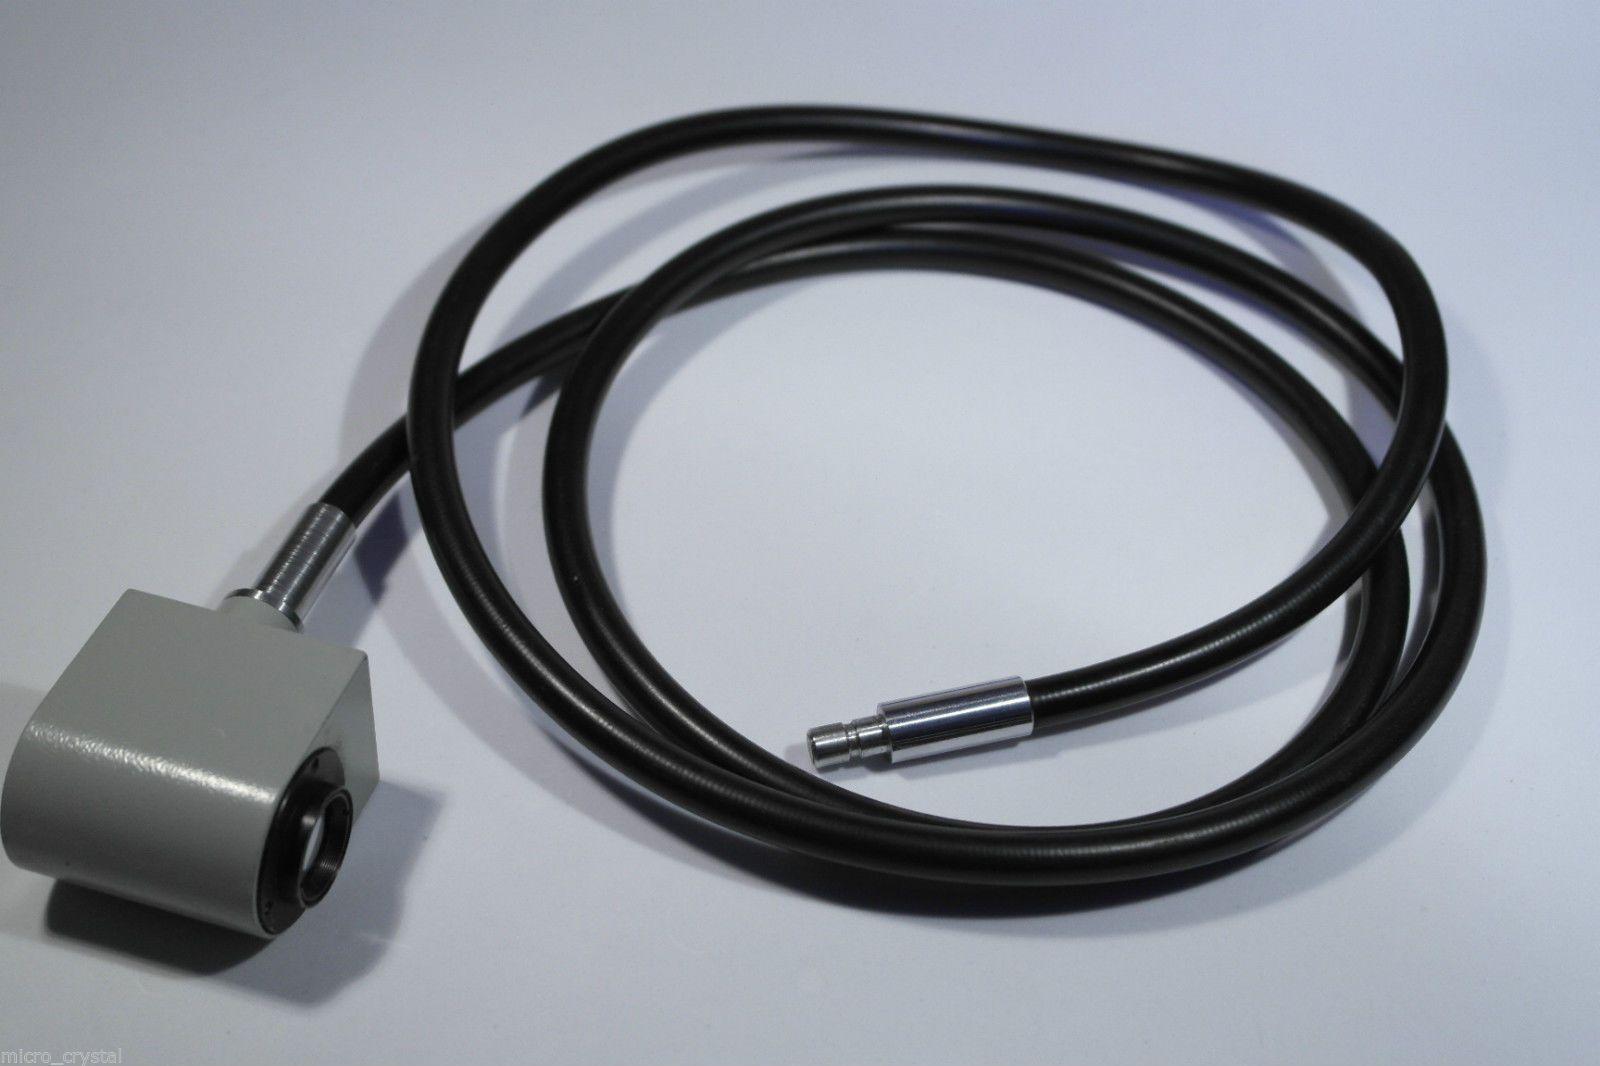 Carl zeiss jena microscope fiber optic light guide part illuminator